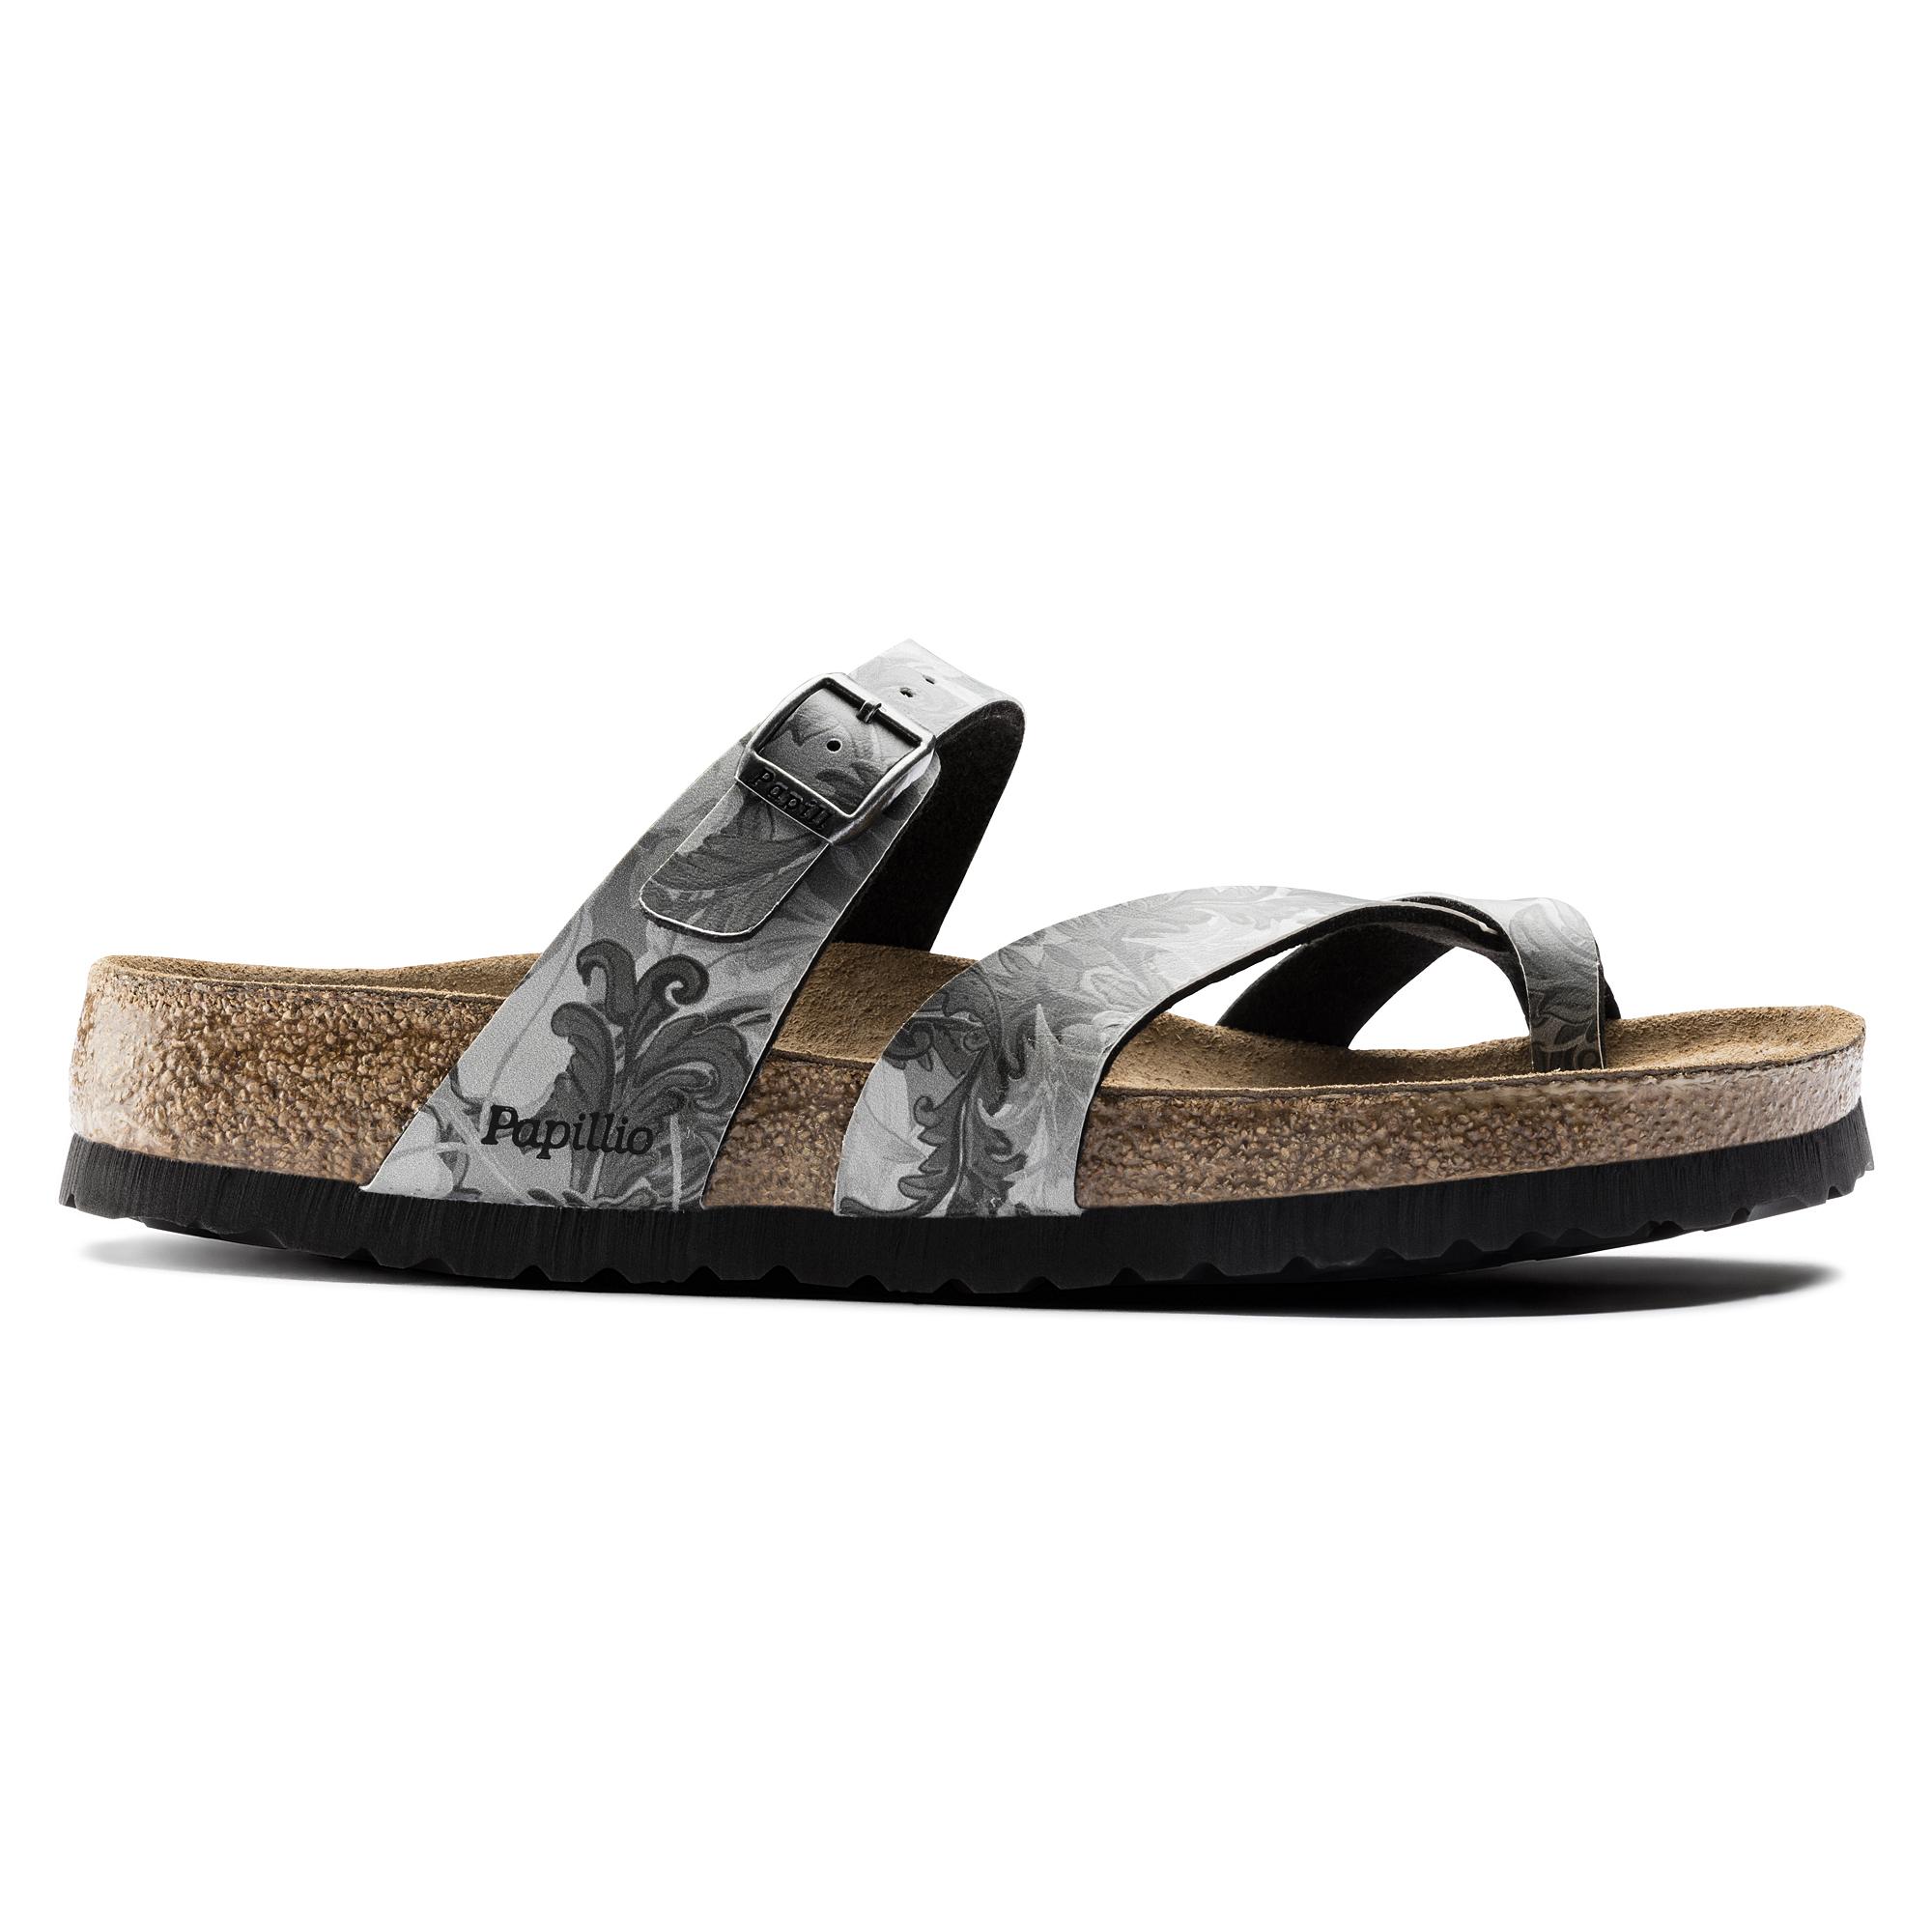 Womens Tabora Birko-Flor Softfootbed Flip Flops, Damask Grey Papillio